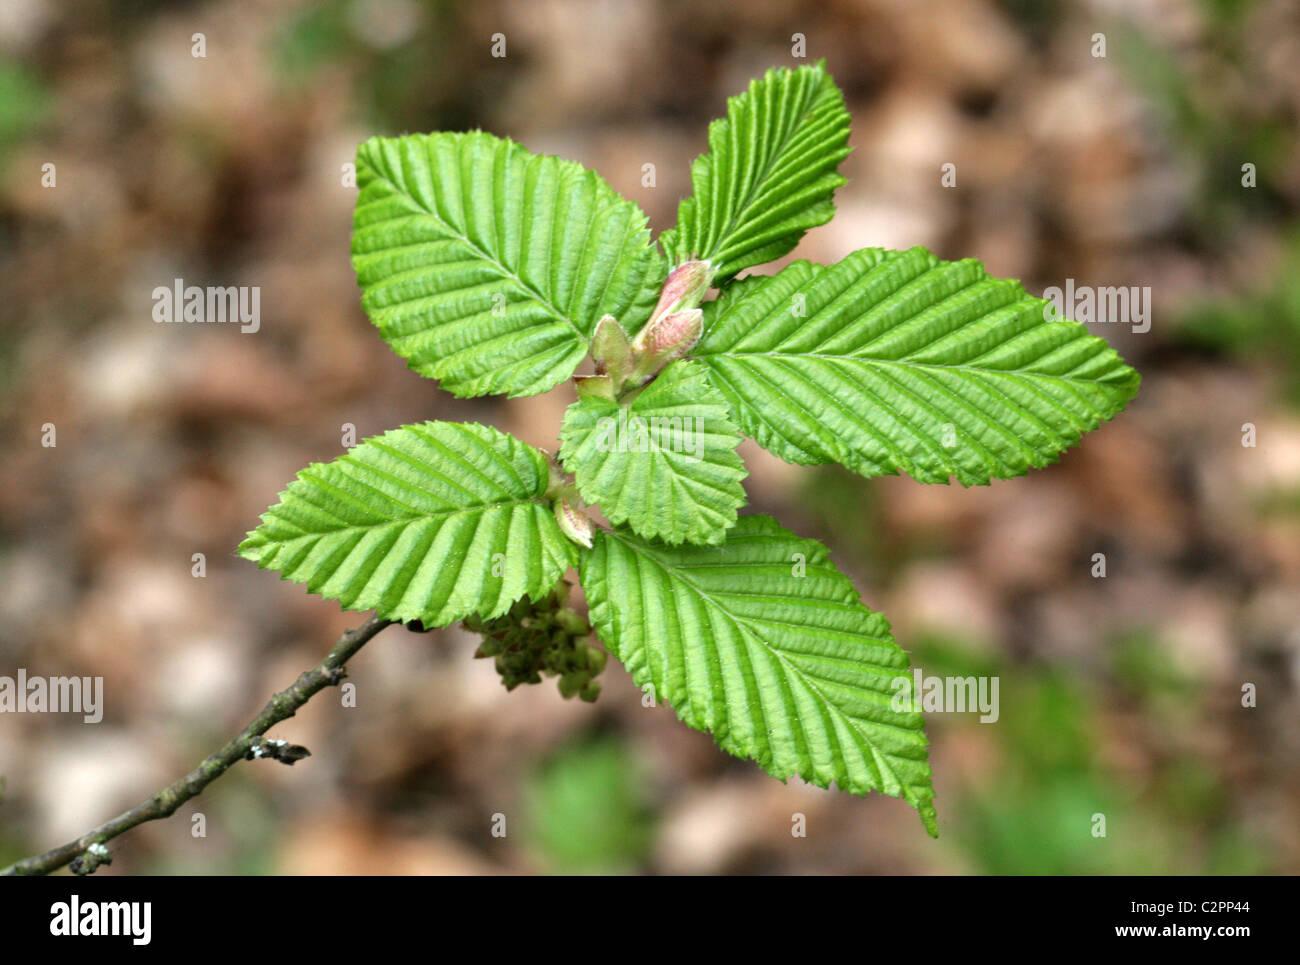 Fresh Young Leaves of the European Hornbeam, Carpinus betulus, Betulaceae. - Stock Image